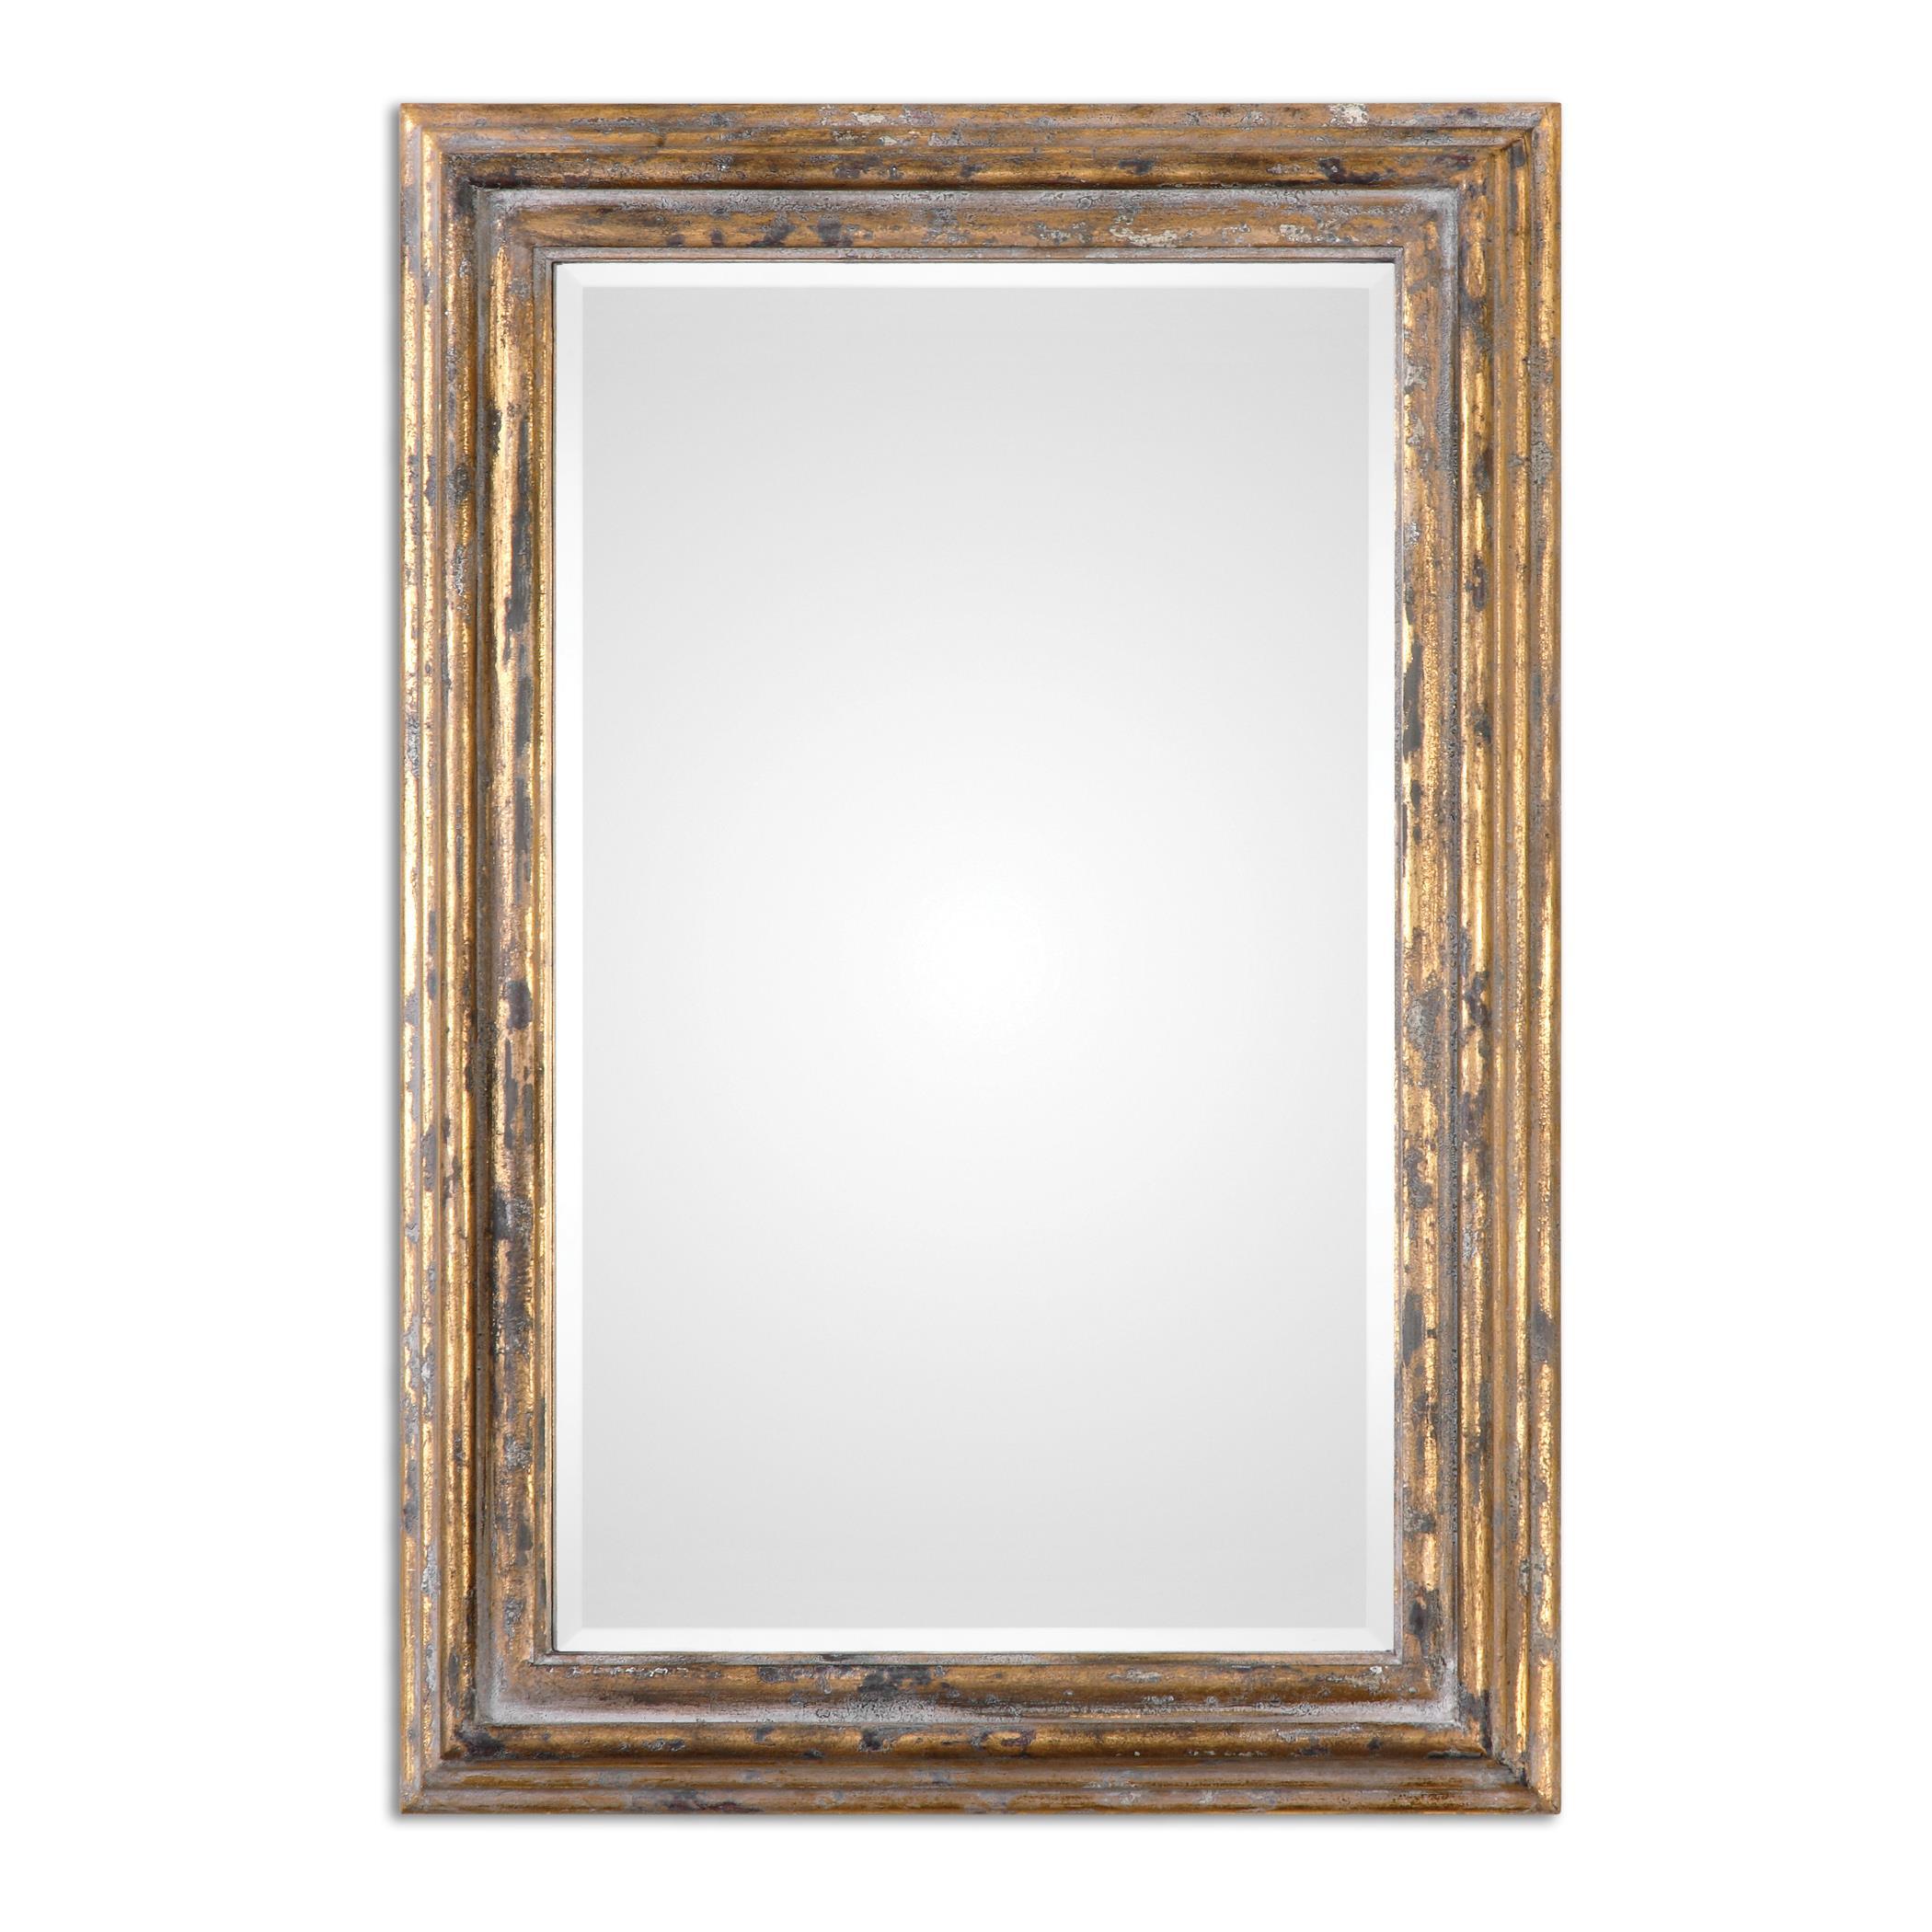 Uttermost Mirrors Davagna Gold Leaf Mirror - Item Number: 12896